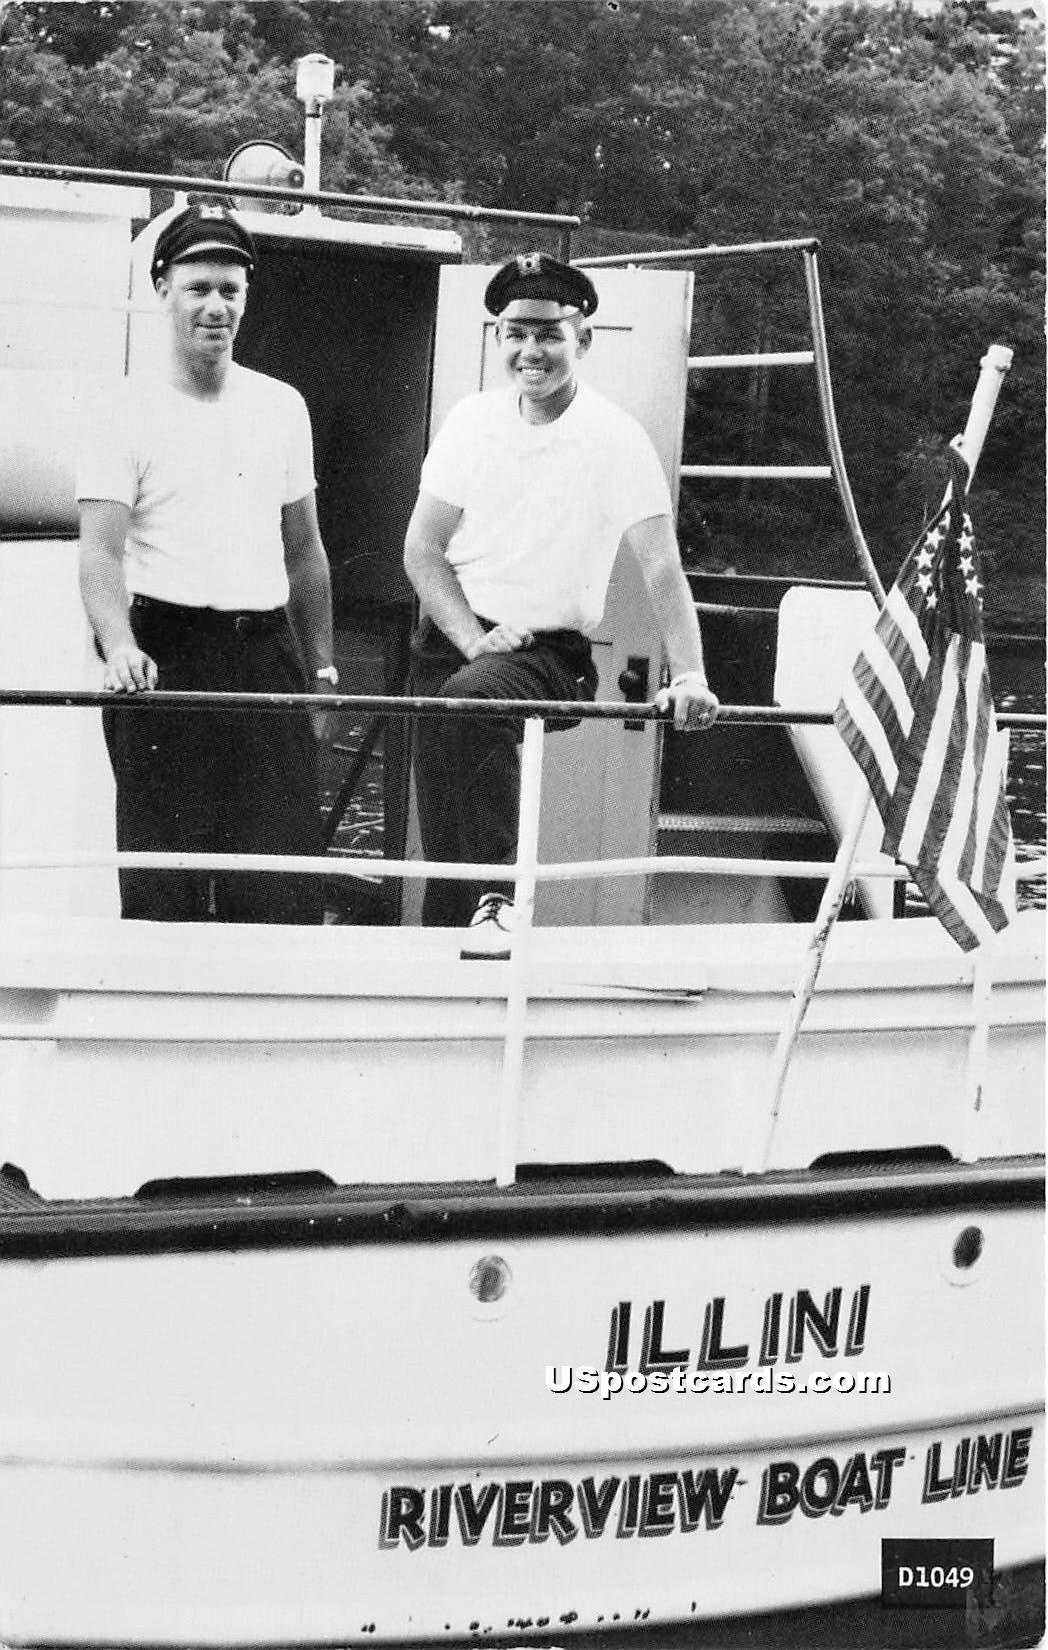 Illini Riverview Boat Line - Misc, Wisconsin WI Postcard